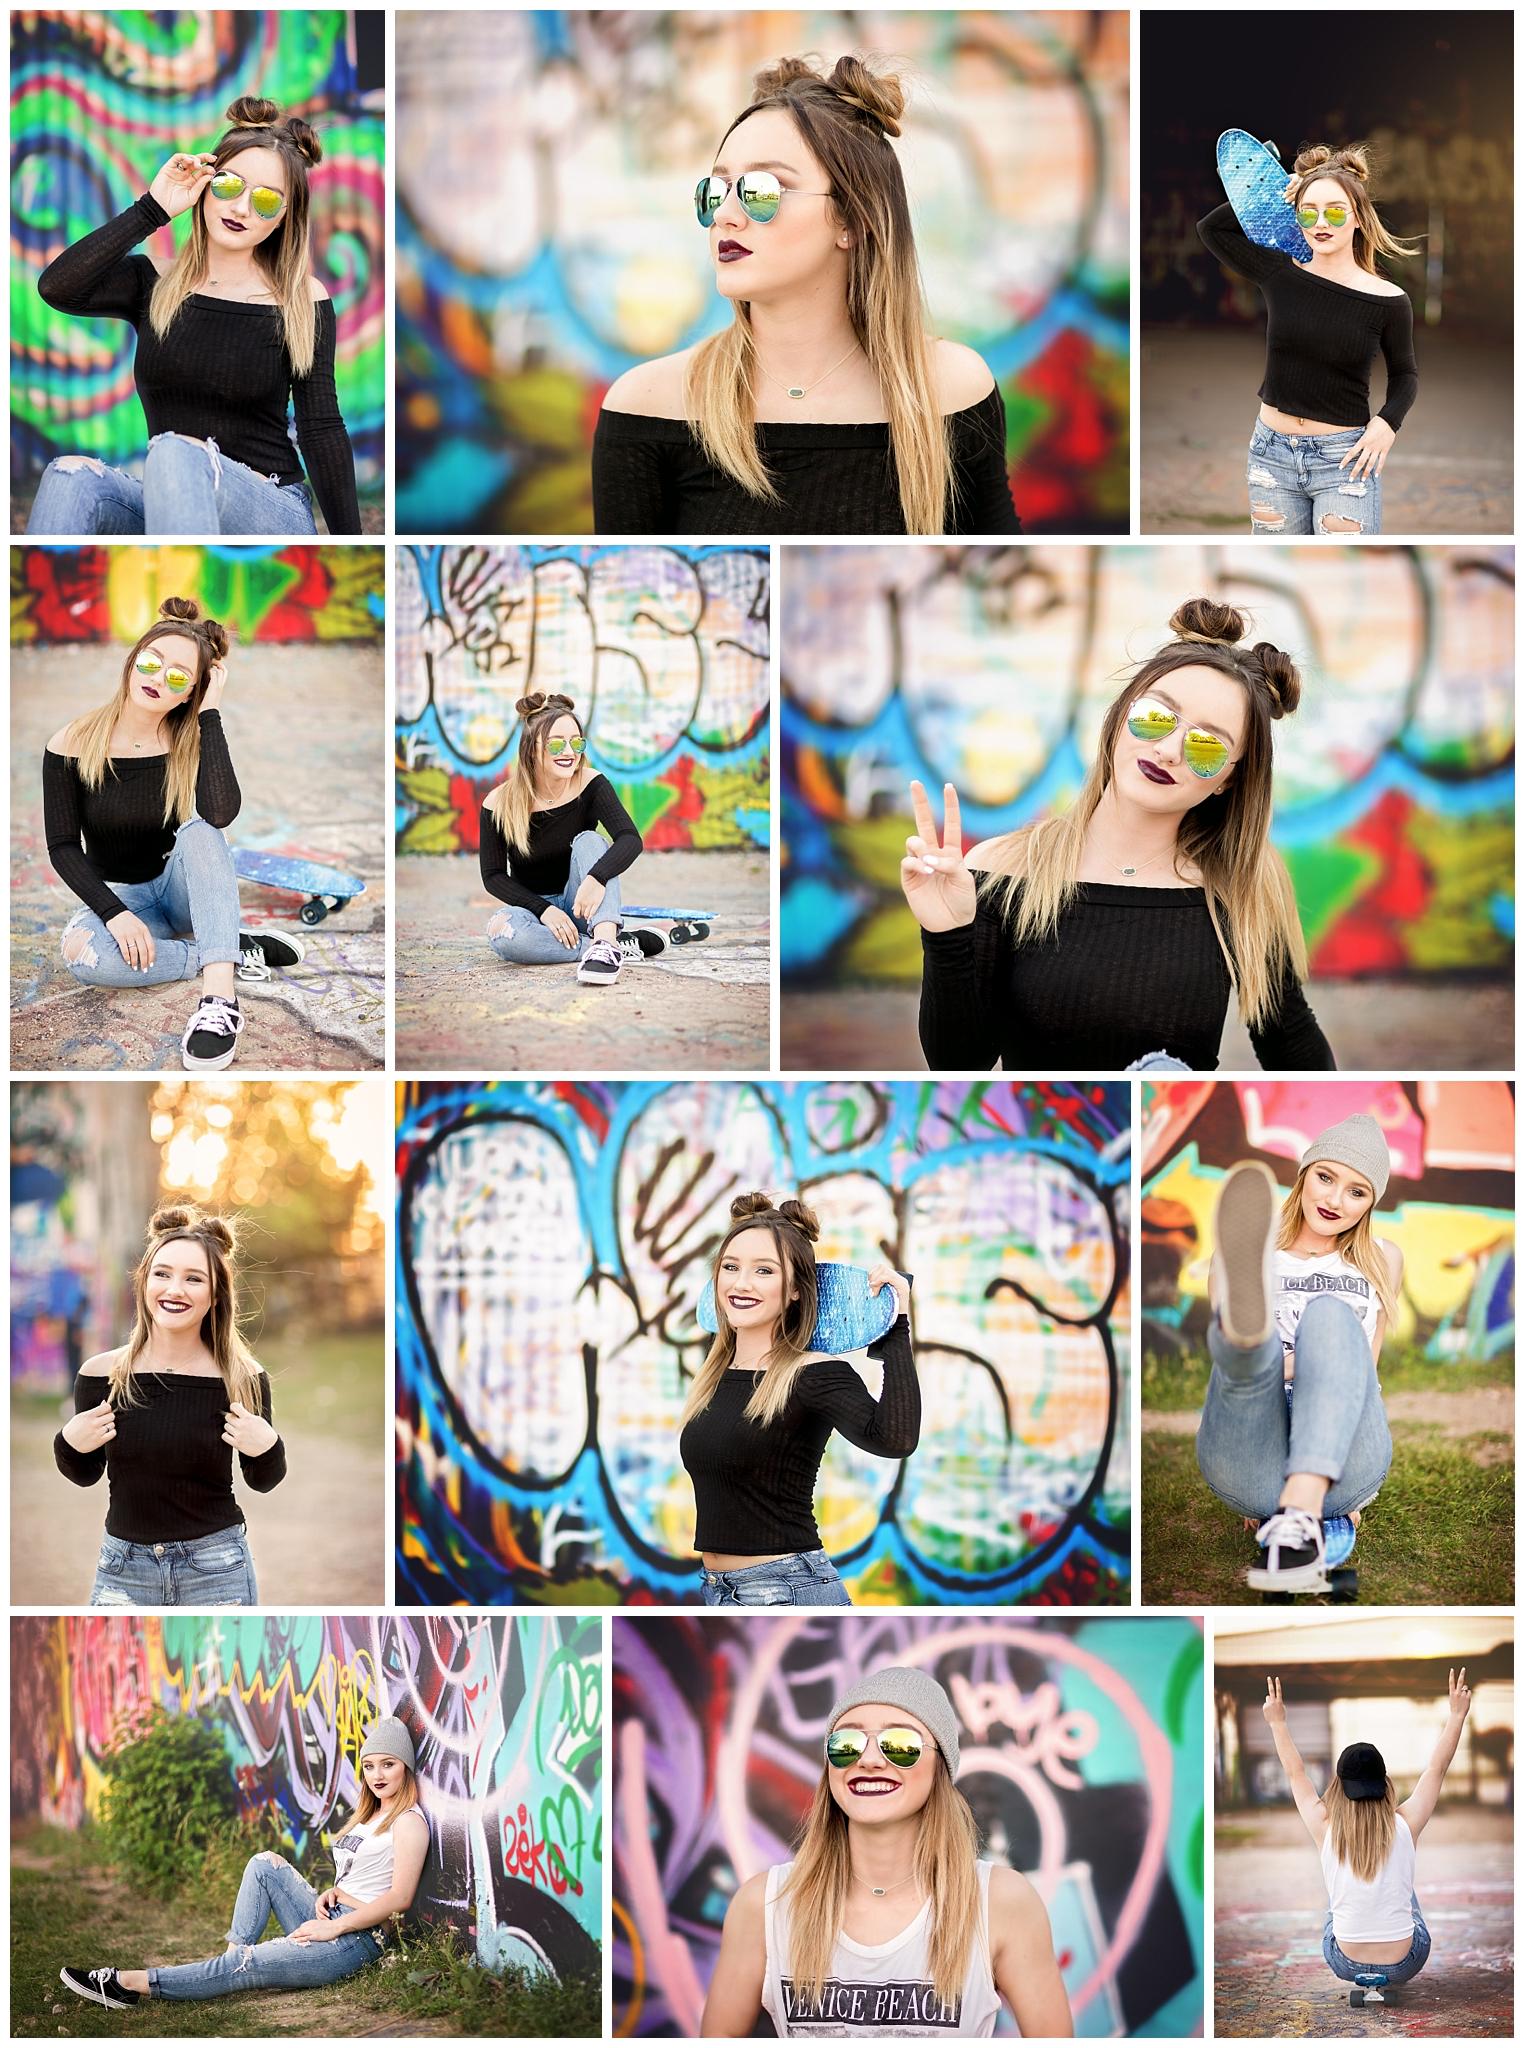 kylee-swisher-photography-dfw-senior-photographer-fort-worth-tx-texas